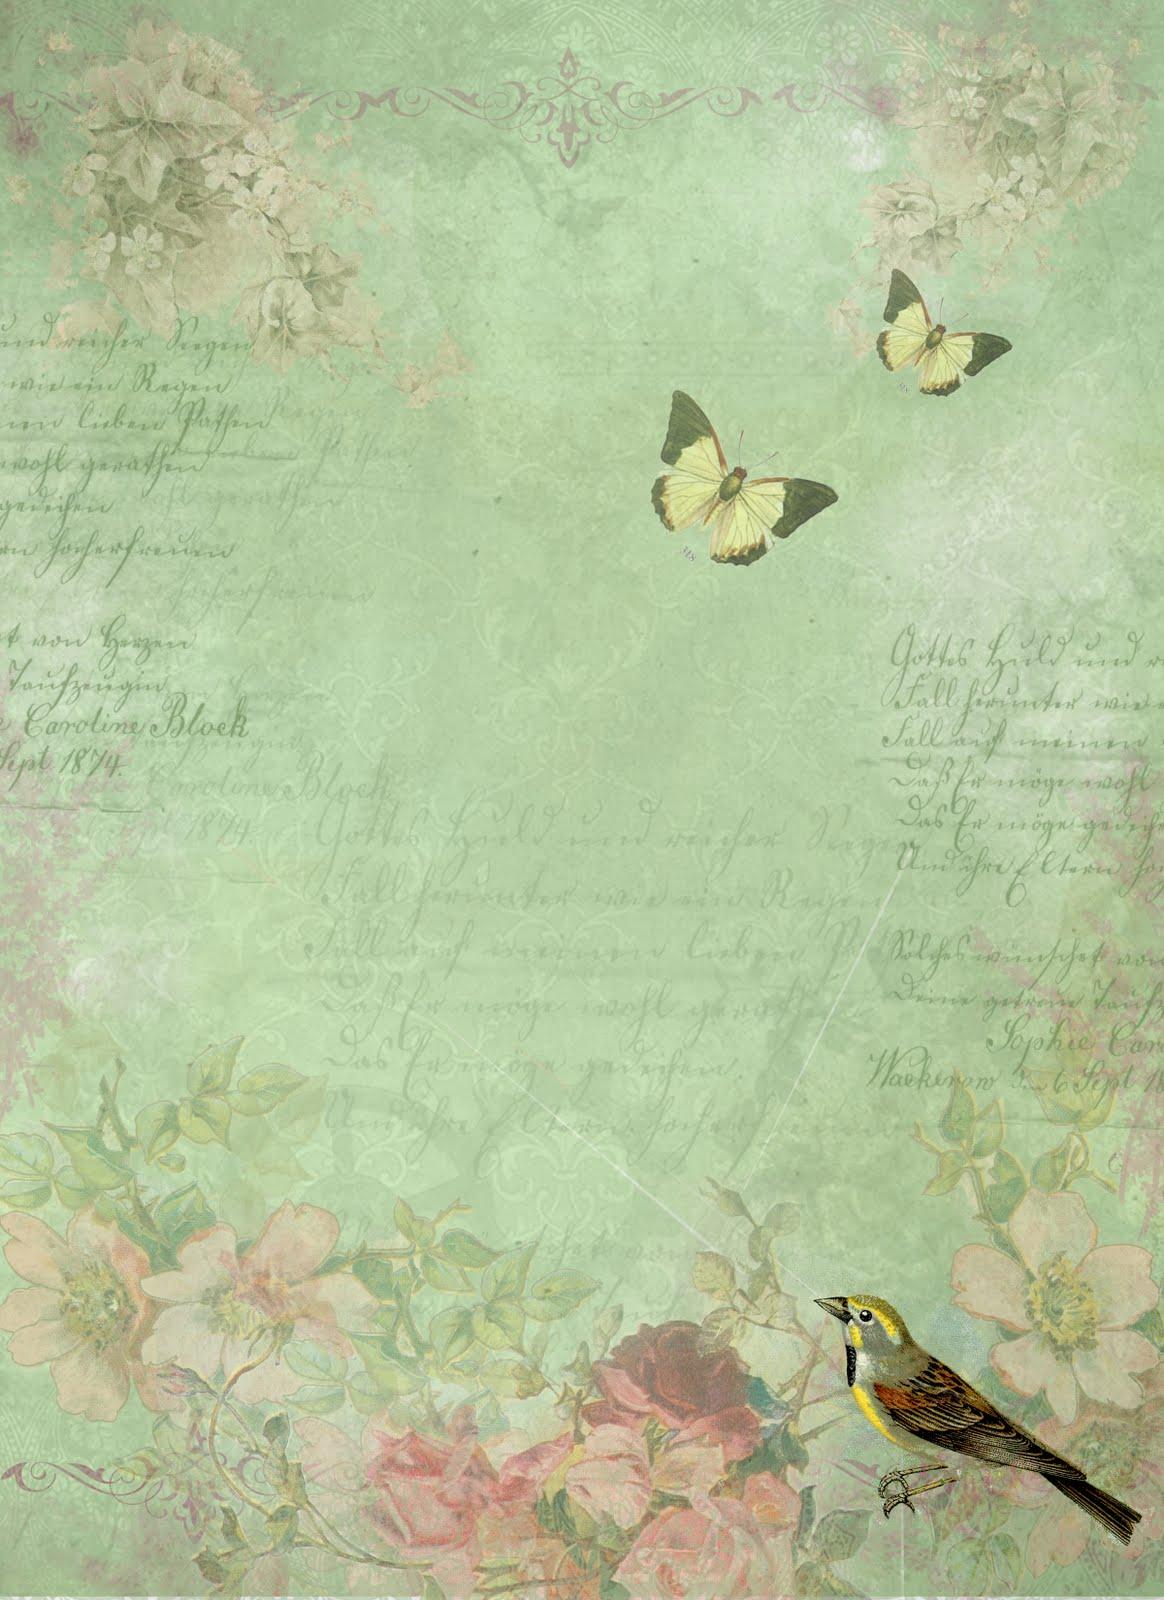 Greentone with bird